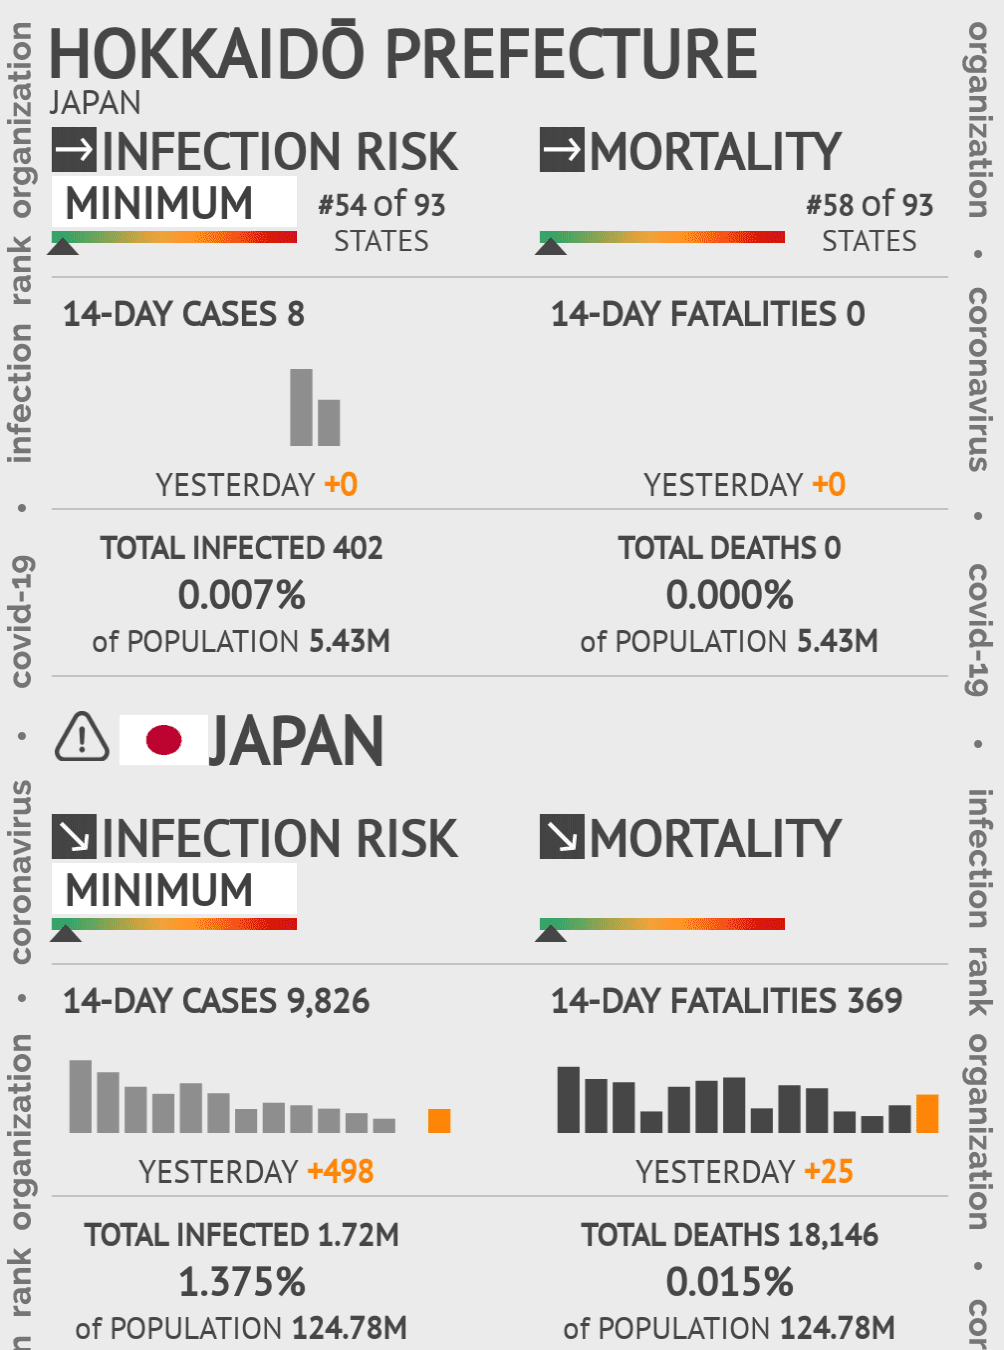 Hokkaidō Prefecture Coronavirus Covid-19 Risk of Infection on May 14, 2020